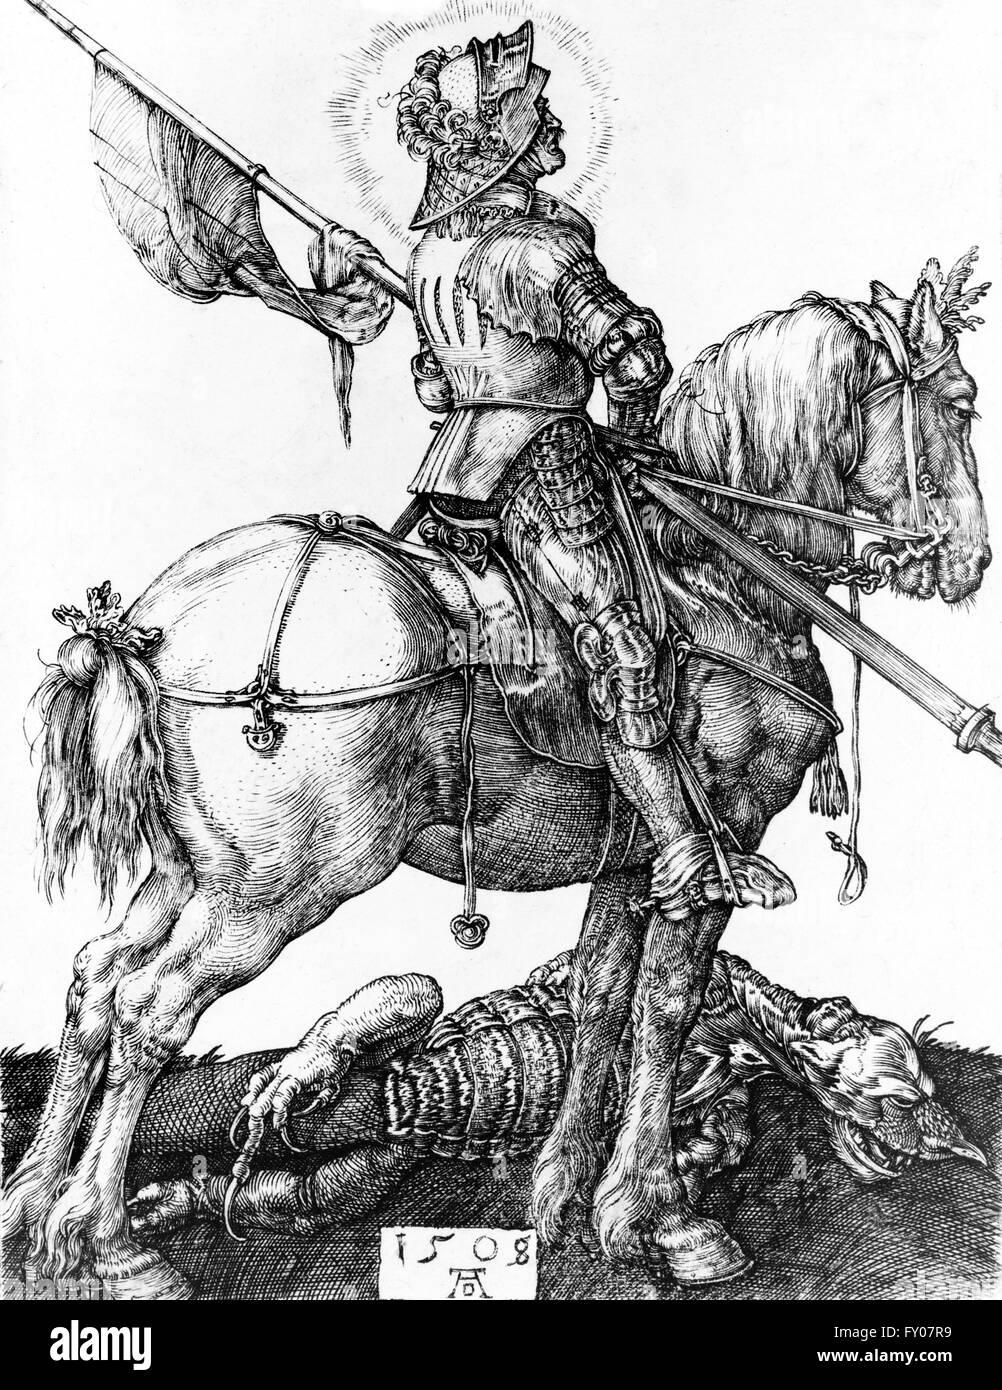 An illustration of St George on horseback, having slayed the dragon. Artist, Albrecht Dürer, 1508 - Stock Image